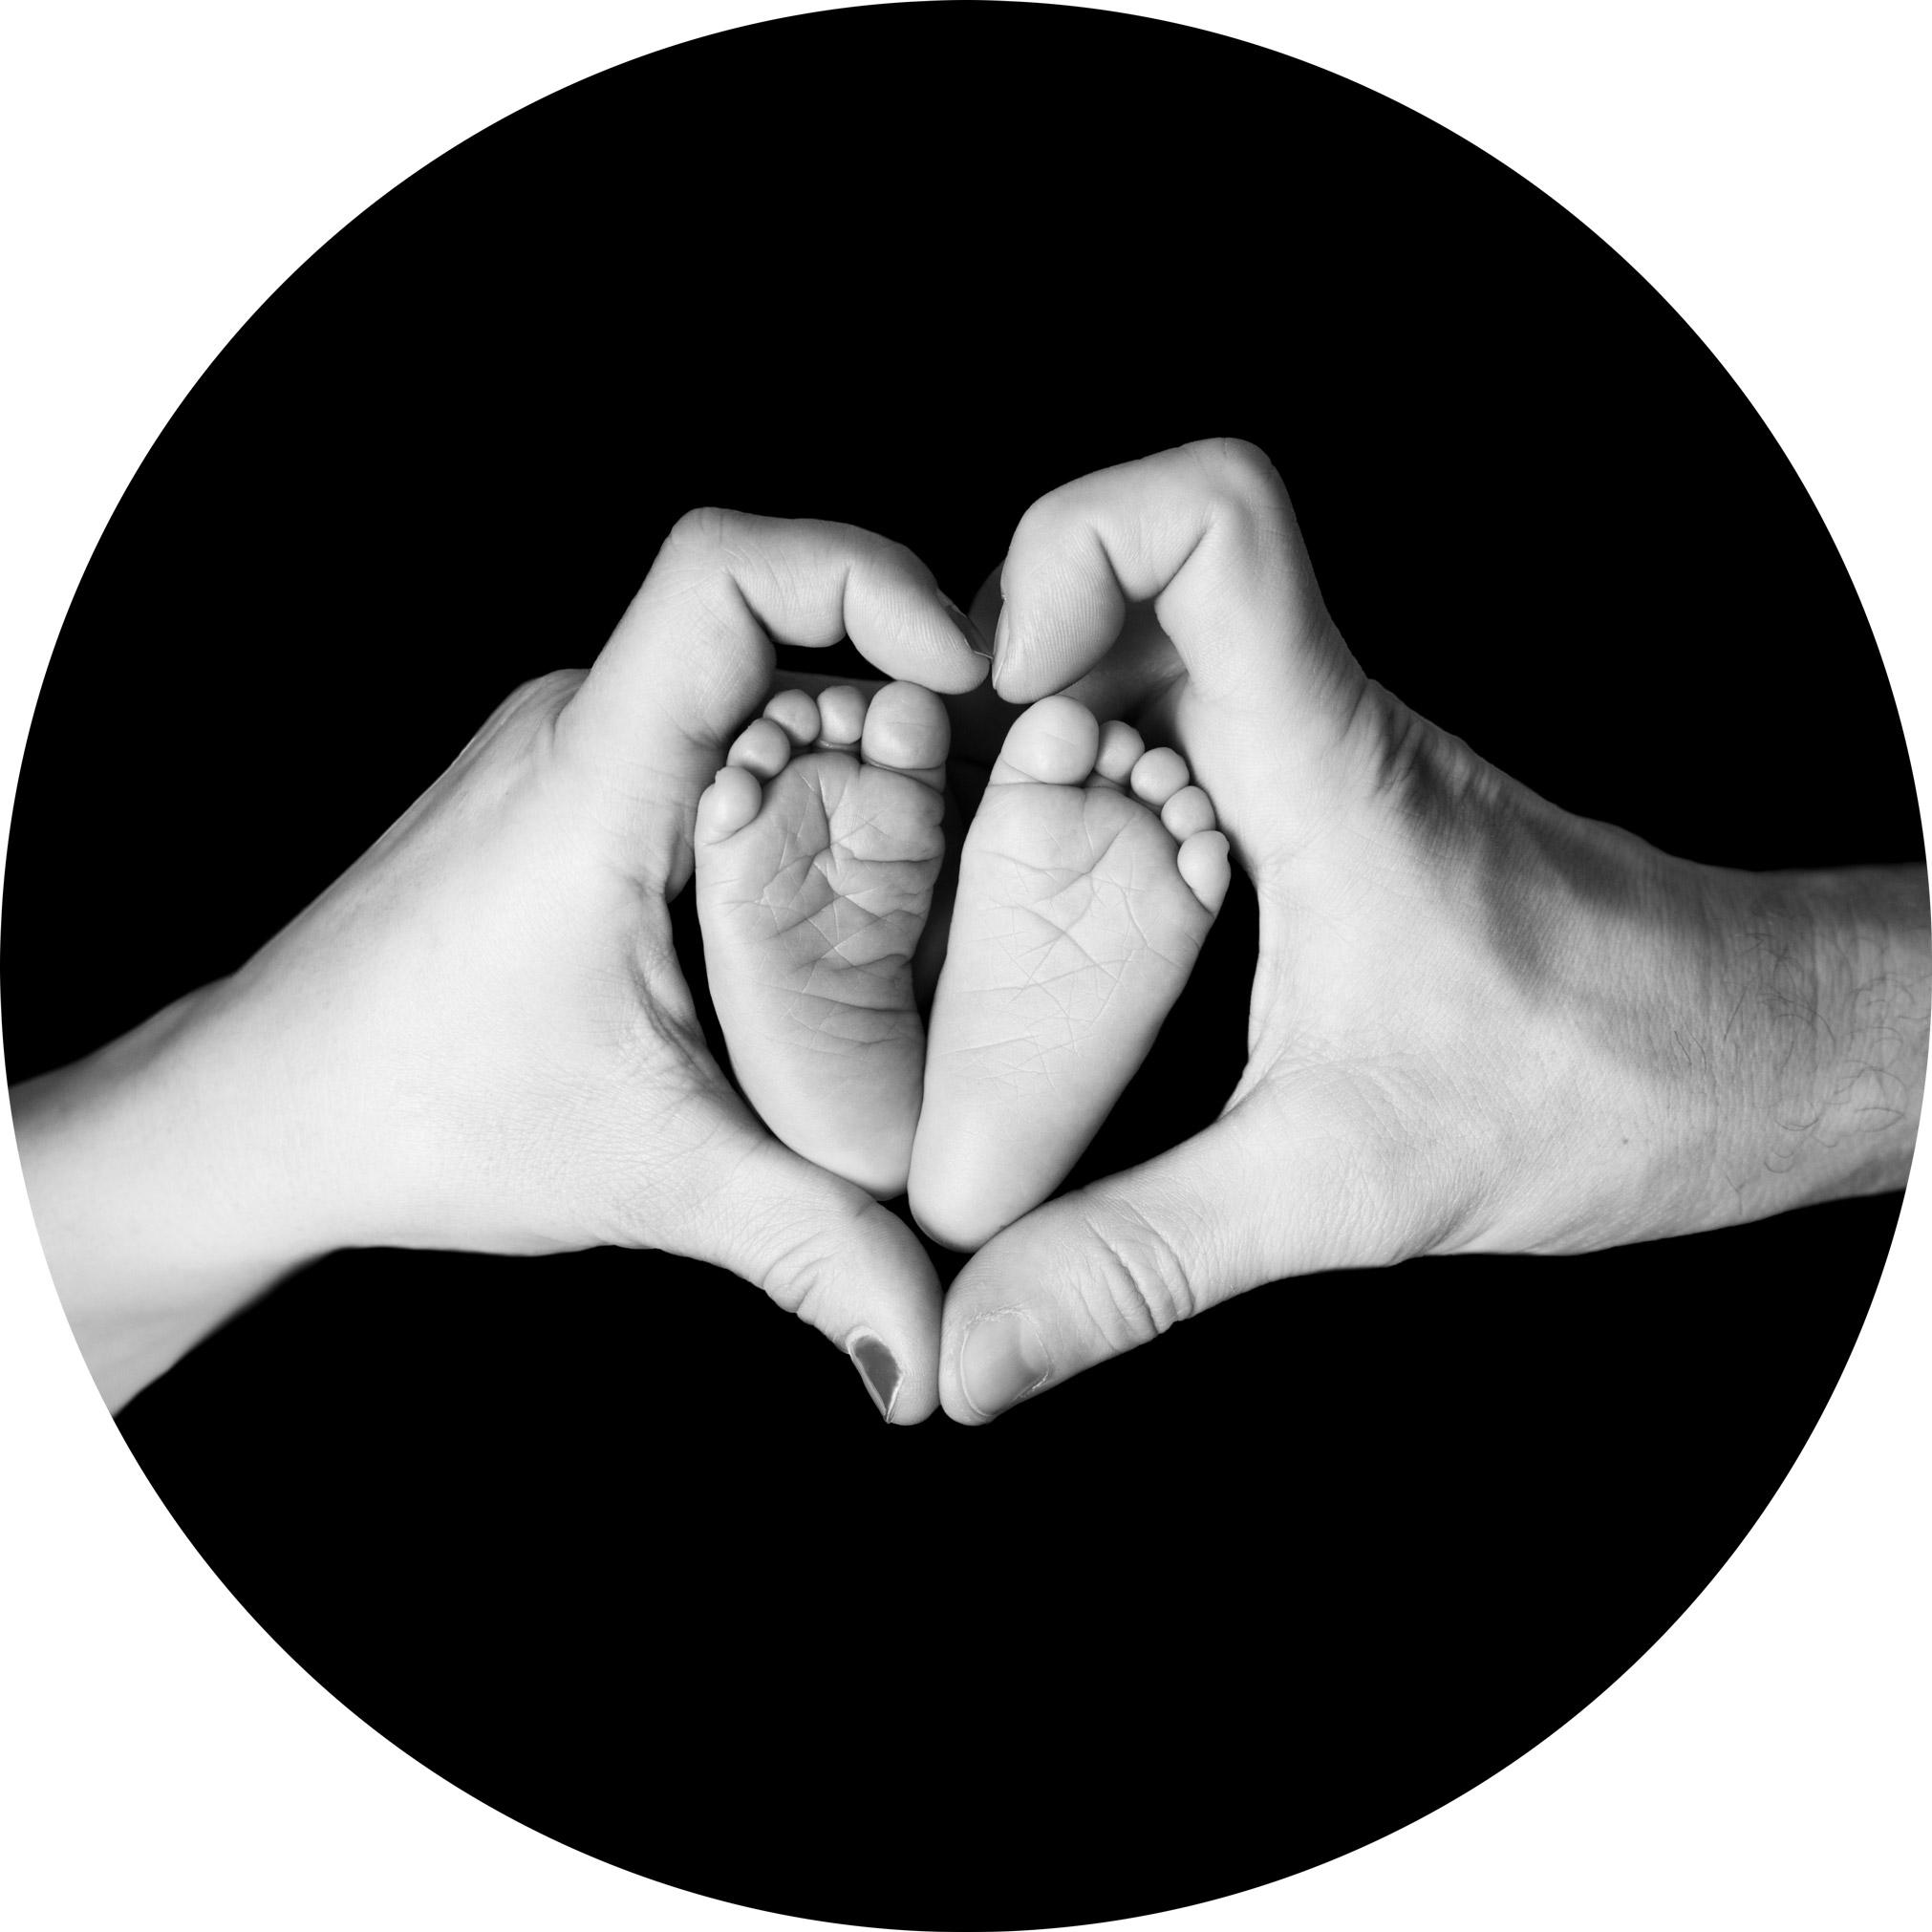 newborn feet in love heart made up of parents hands